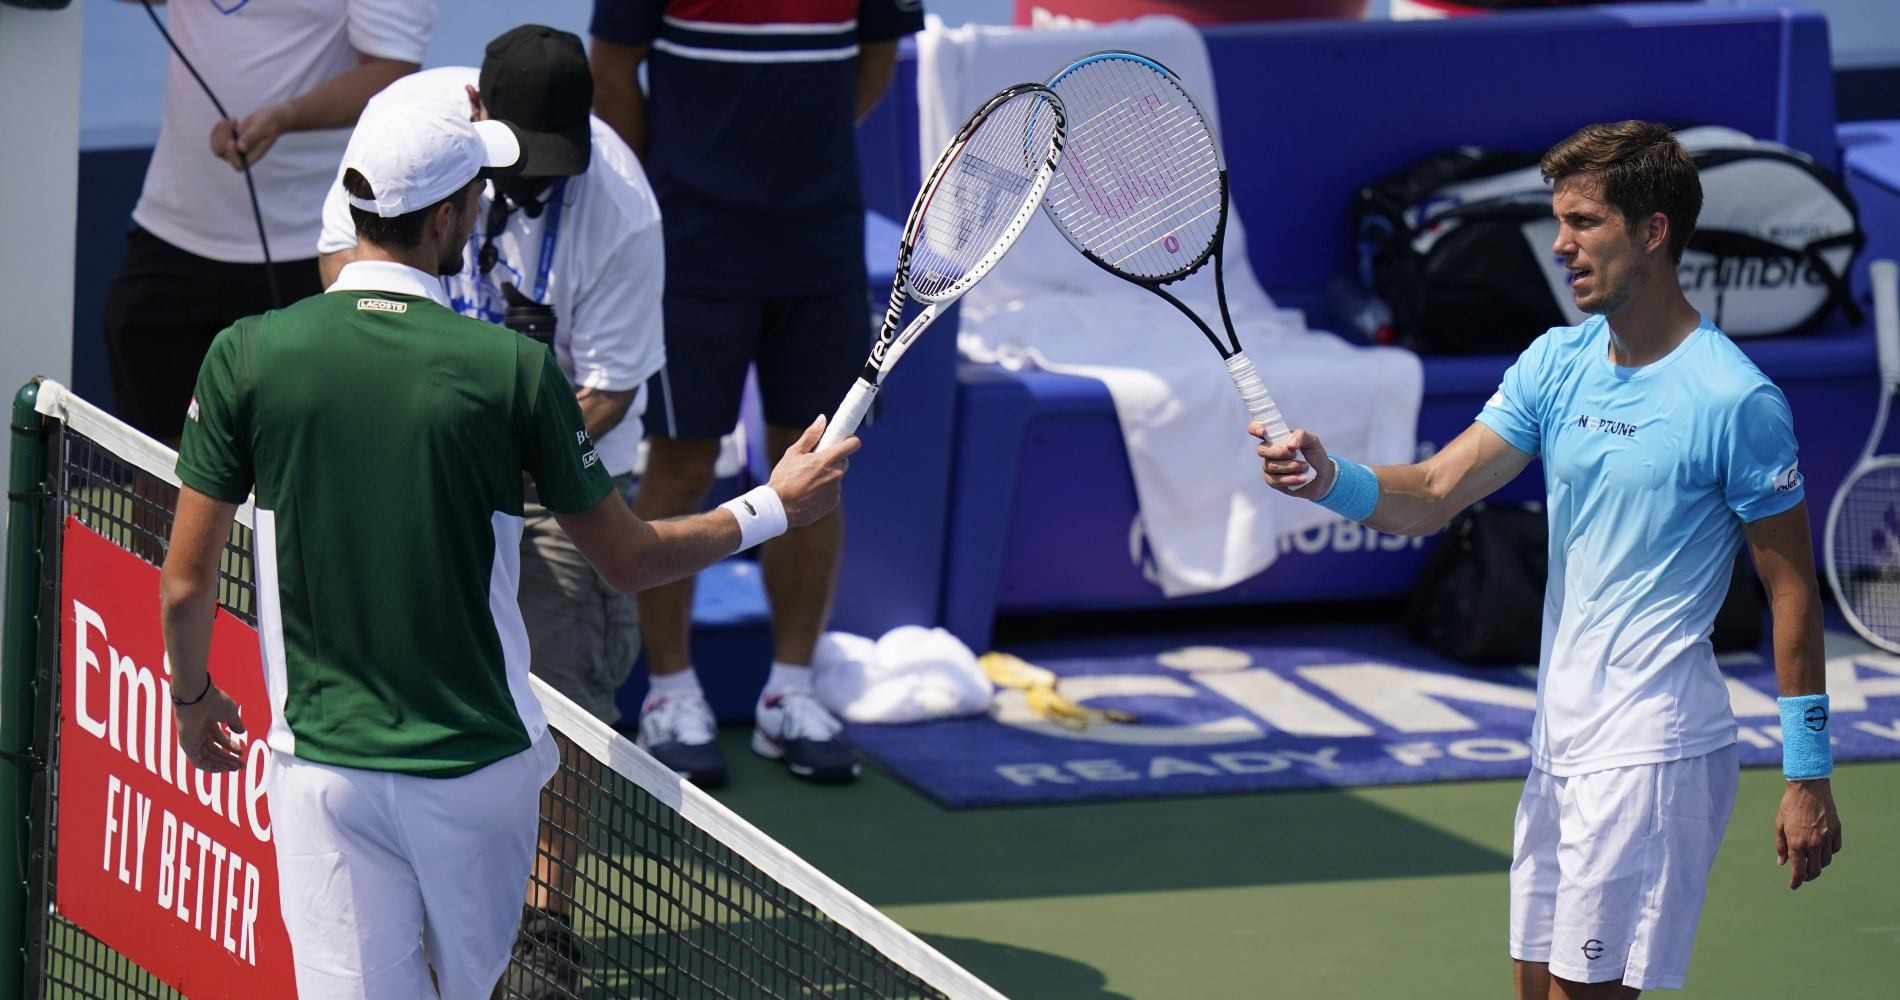 Daniil Medvedev vs Aljaz Bedene, Western & Southern Open (Flushing Meadows / New York), 2020